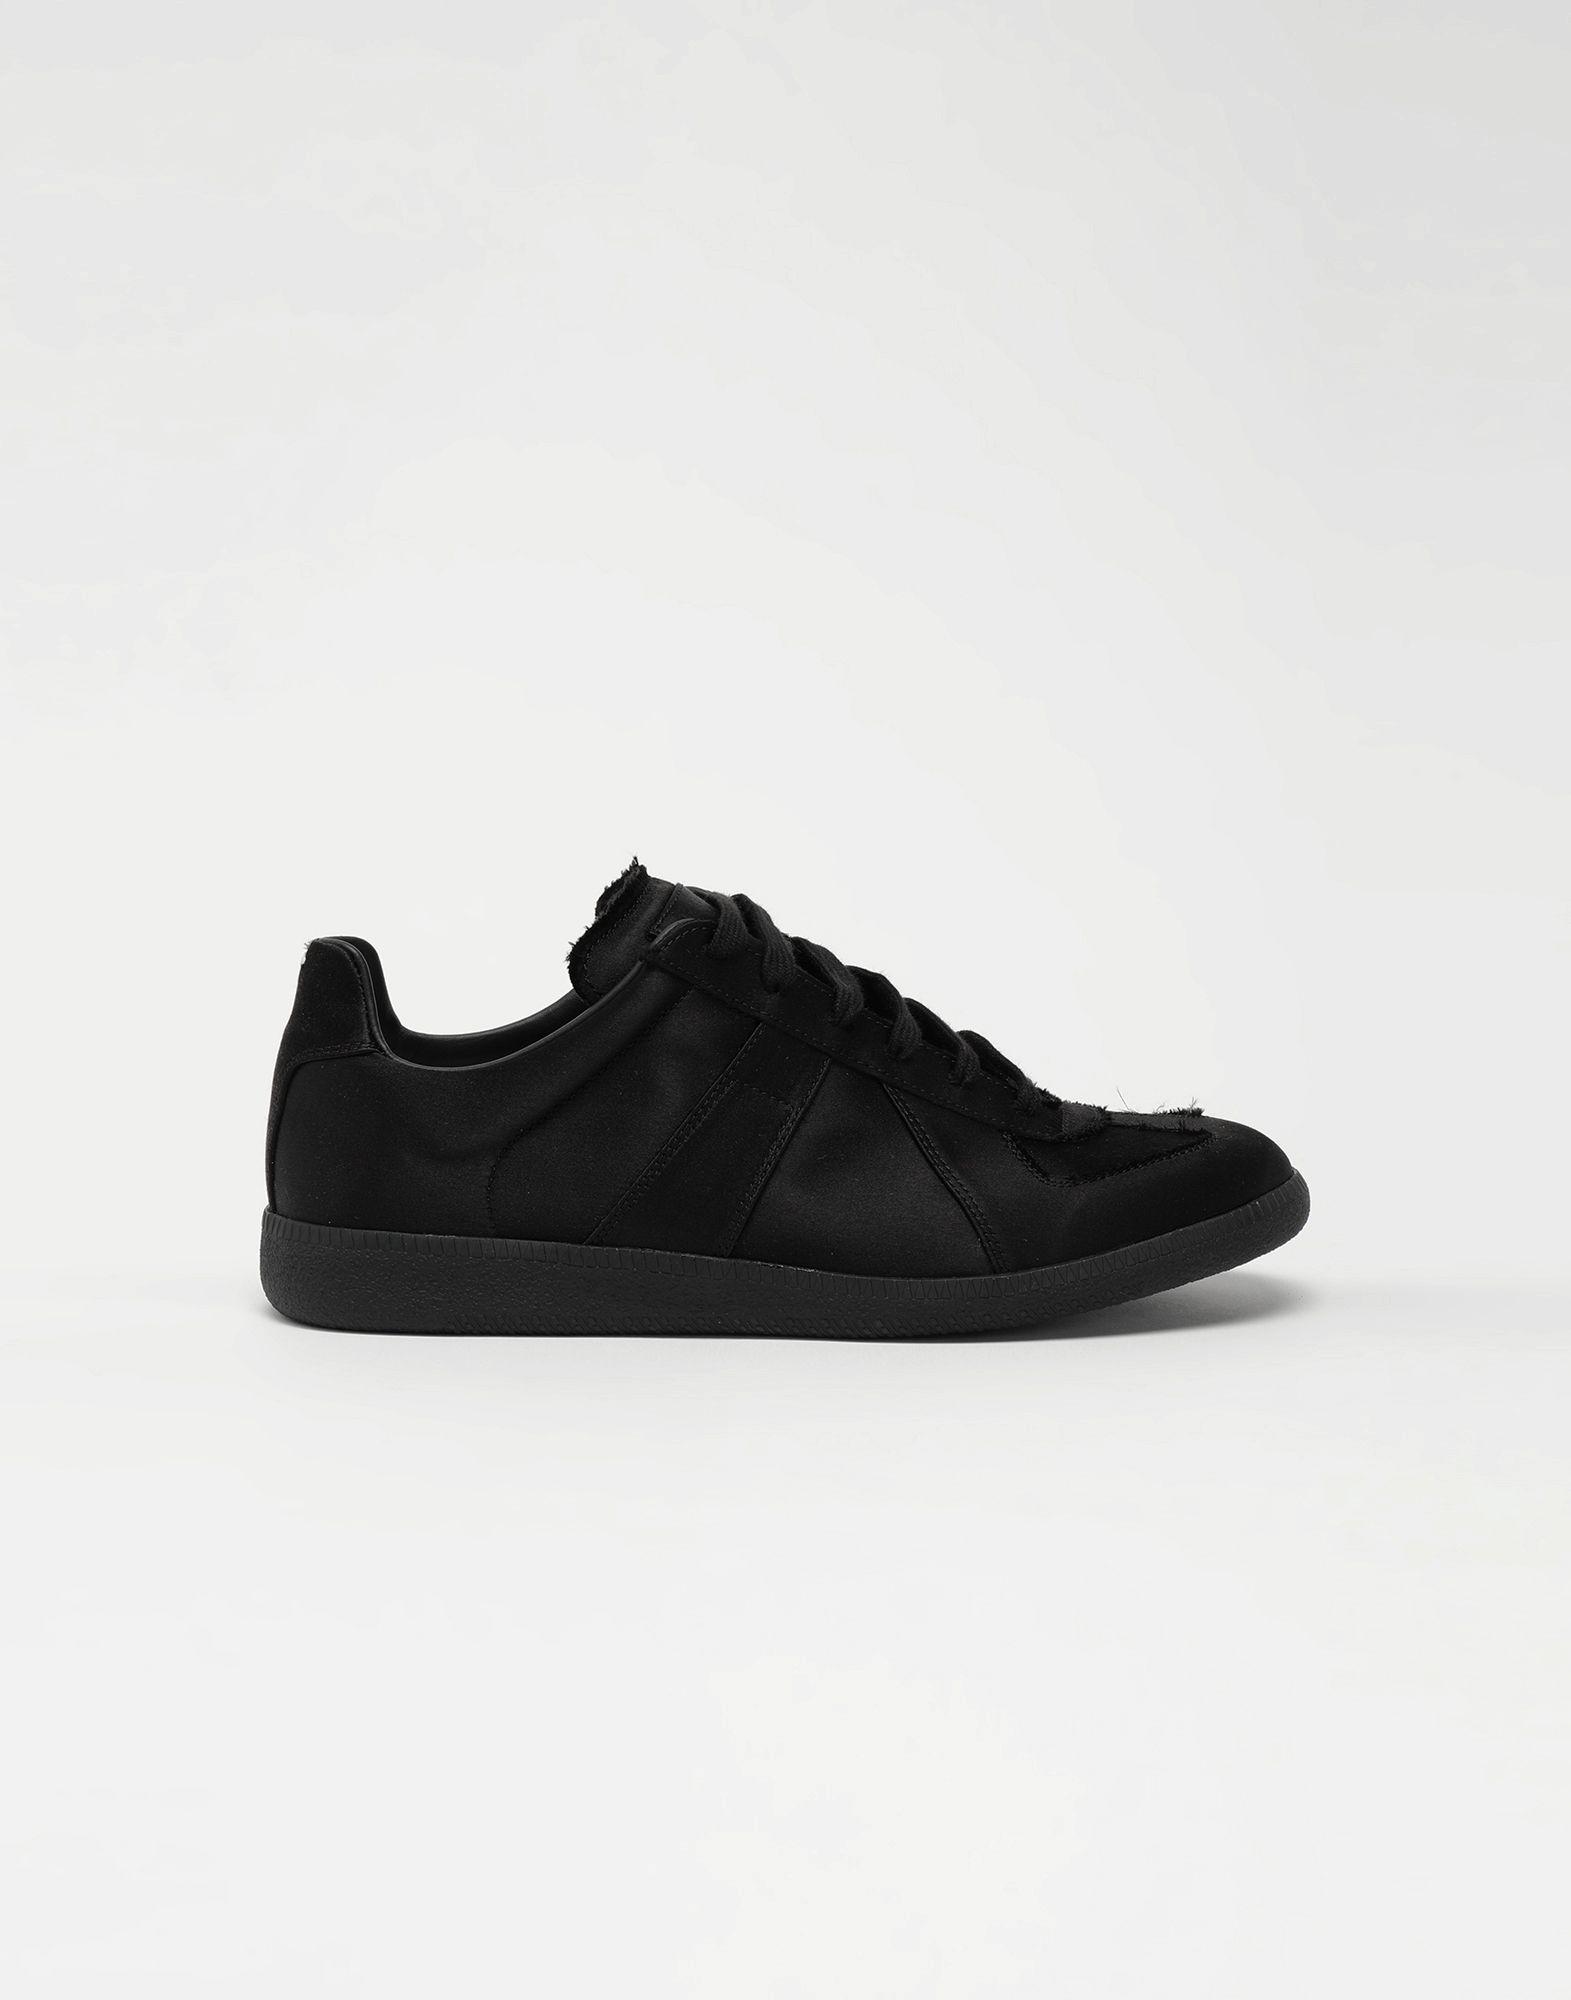 MAISON MARGIELA Replica low top satin sneakers Sneakers Man f